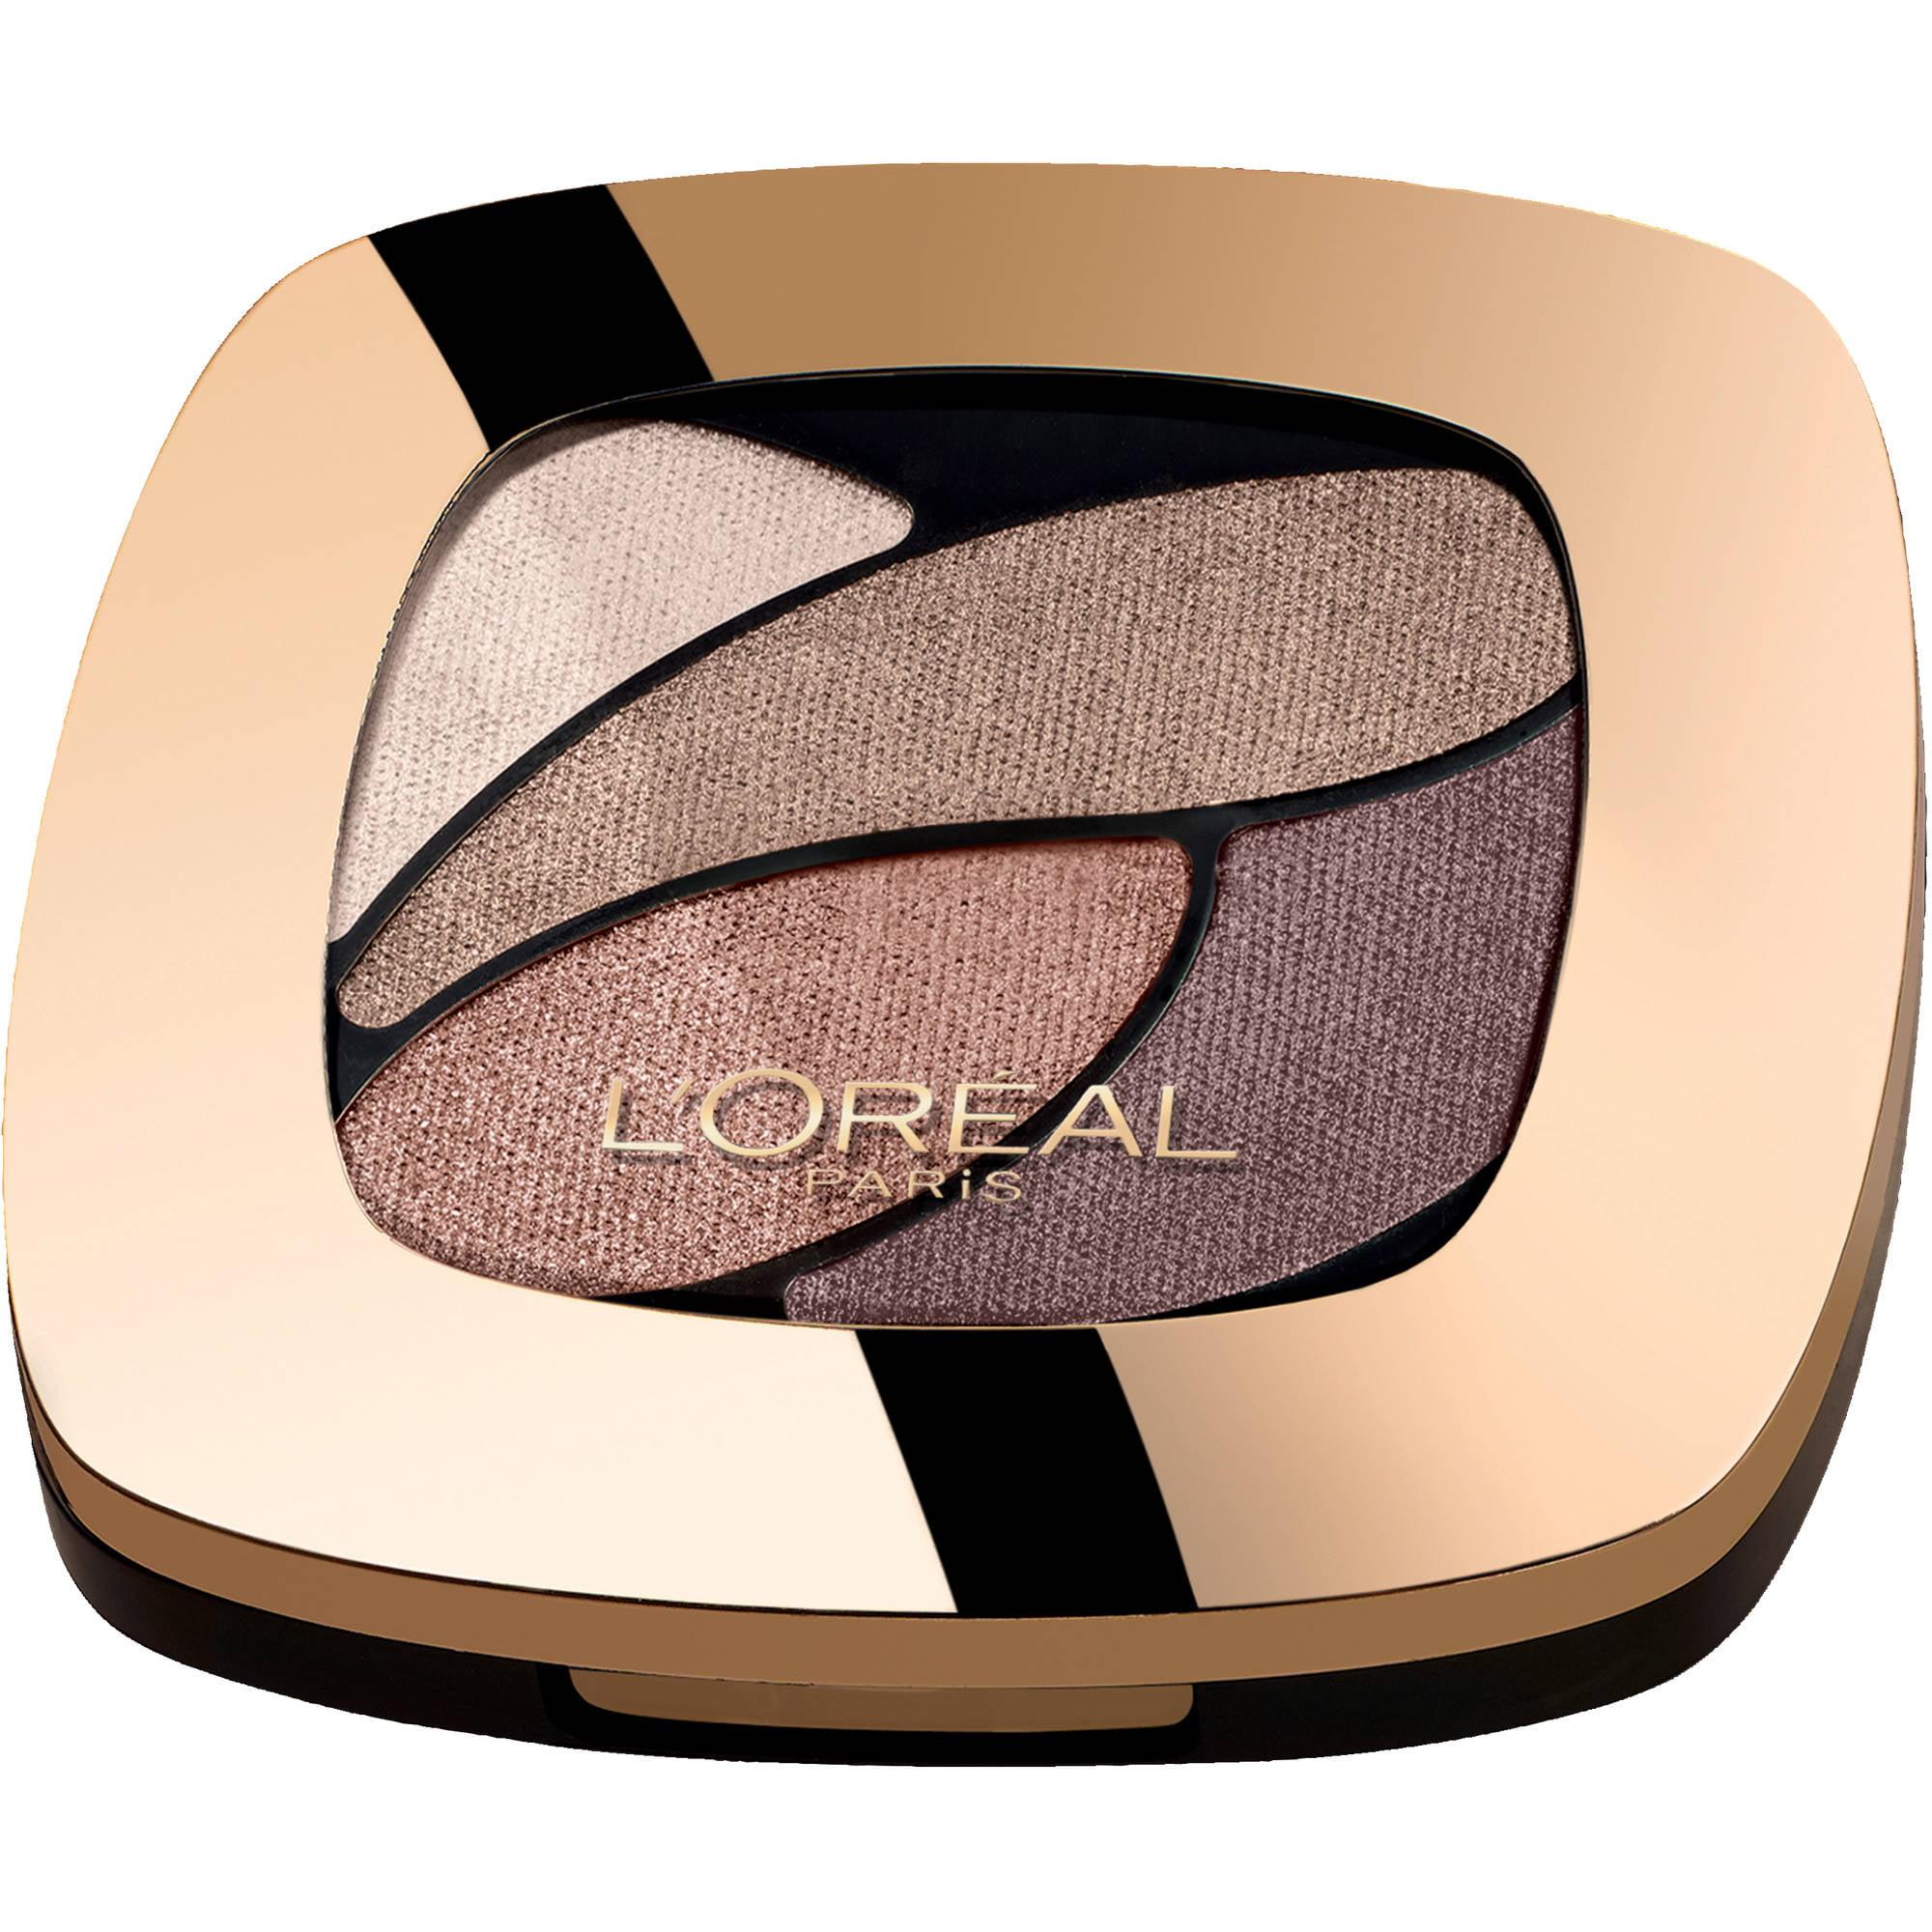 L'Oreal Paris Colour Riche Dual Effects Eye Shadow, Perpetual Nude